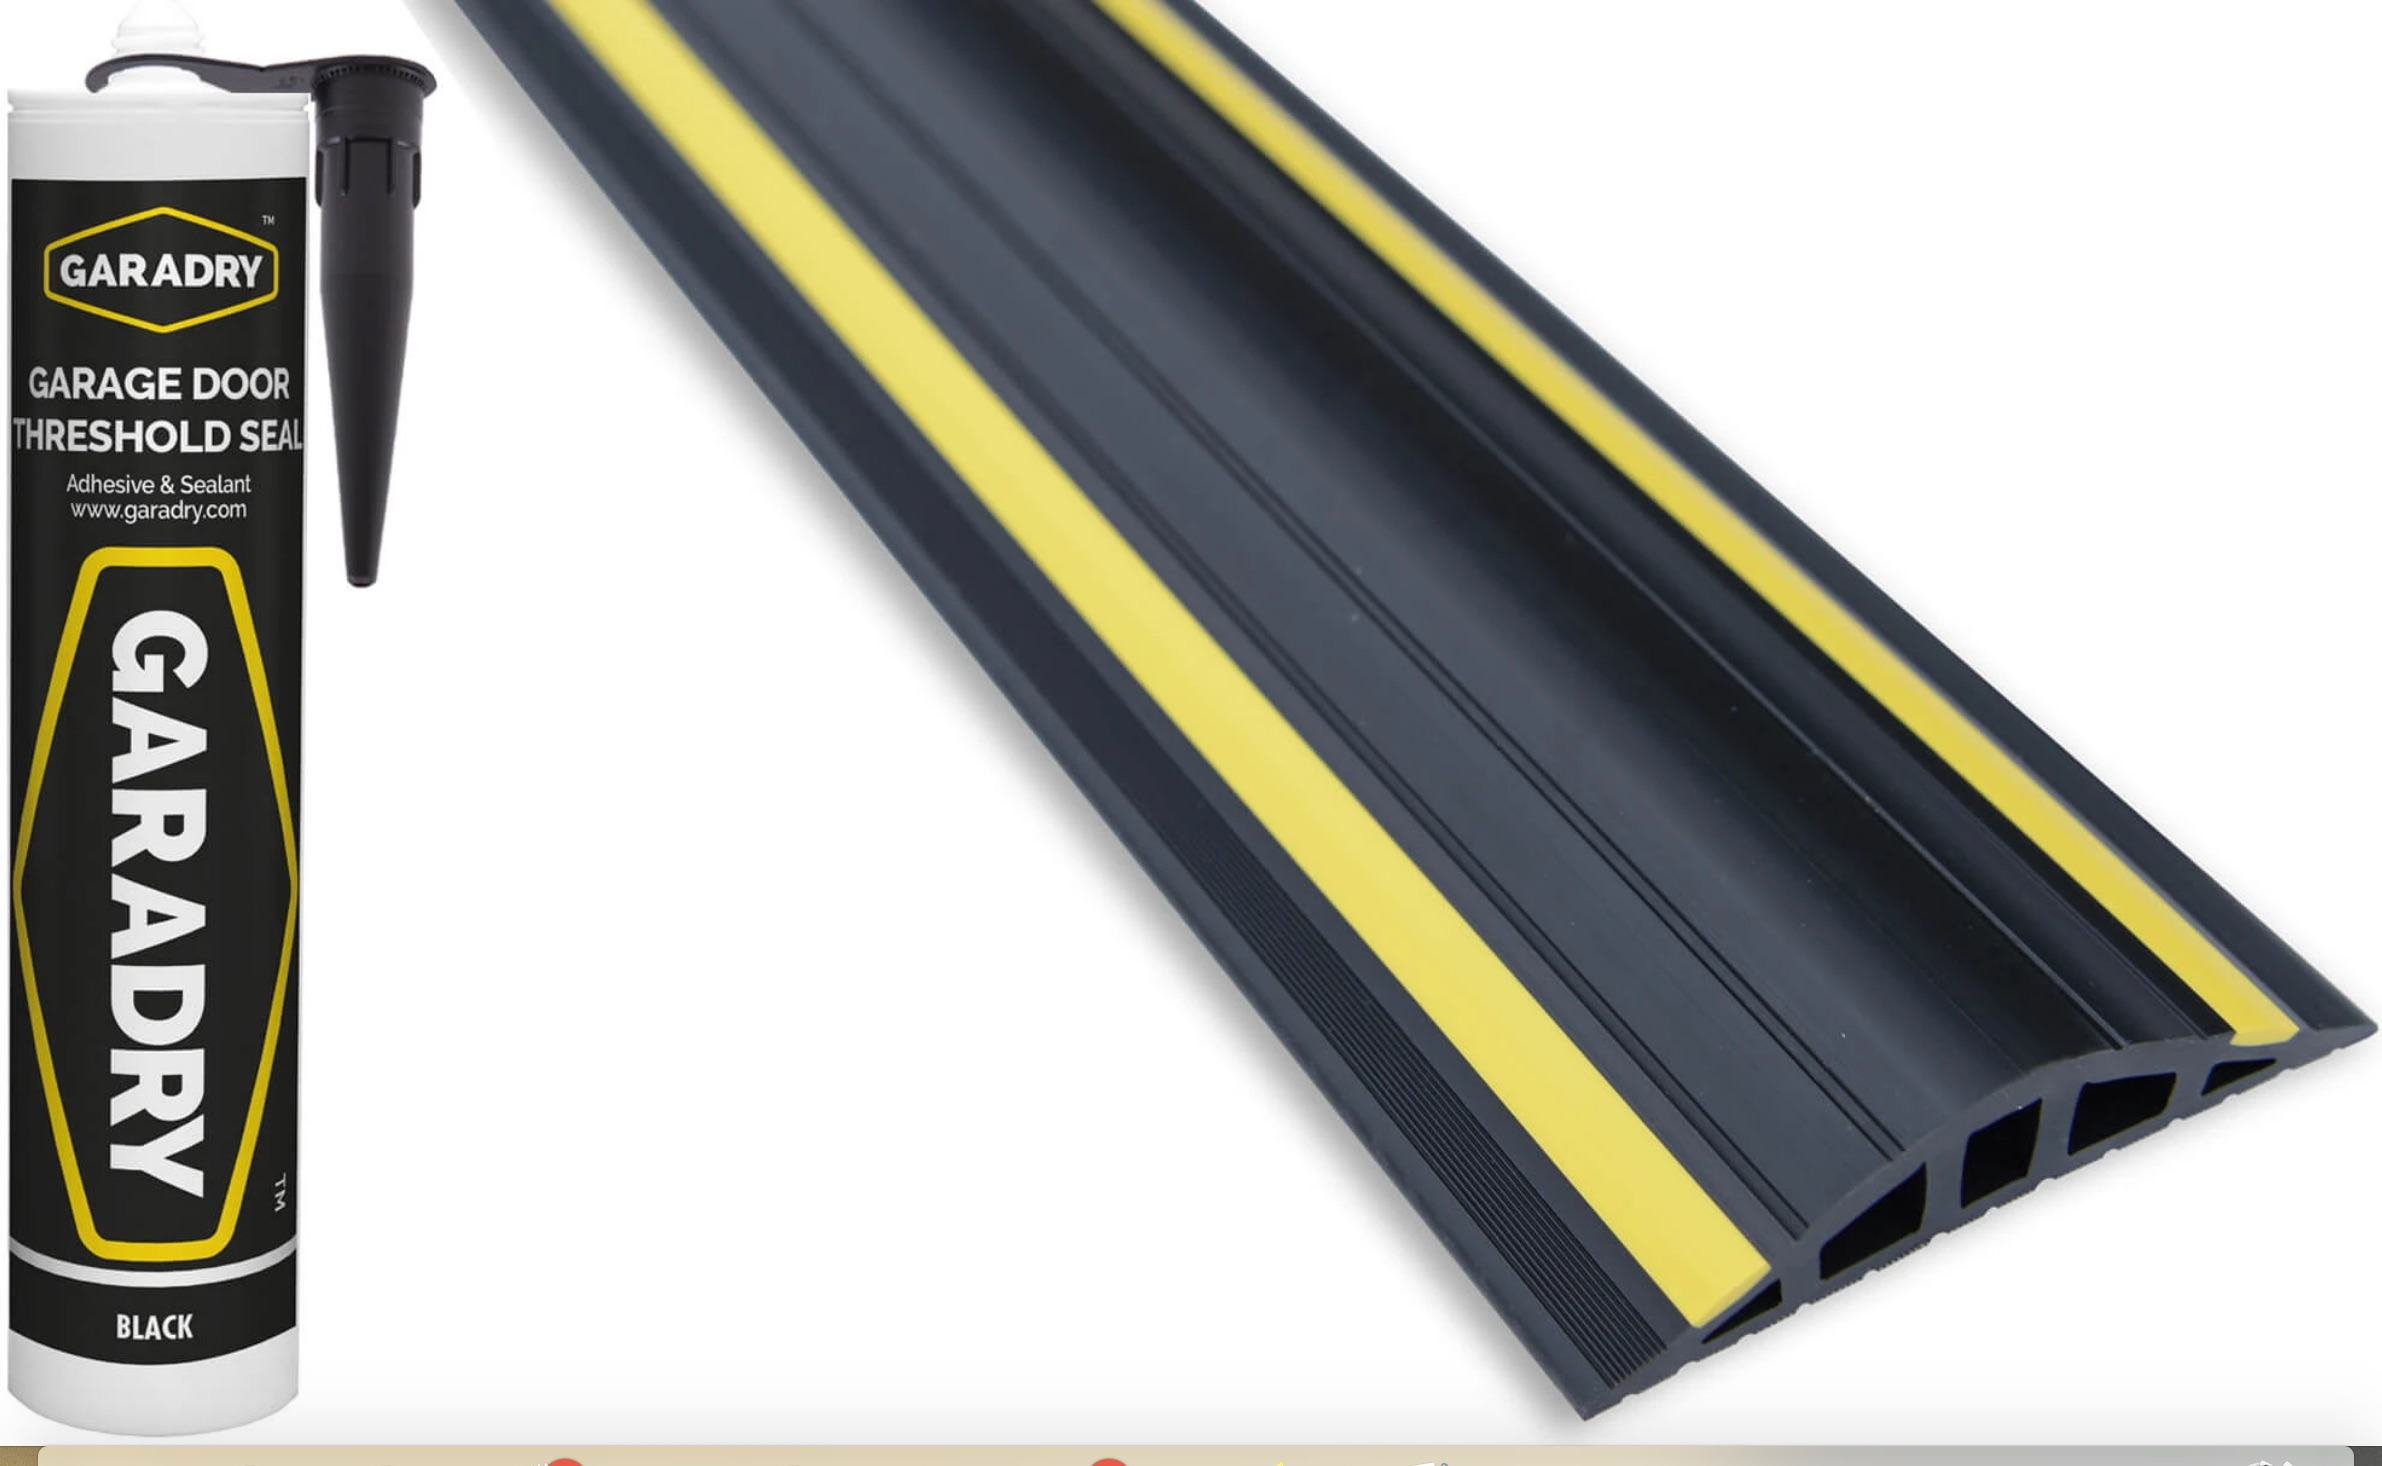 25mm High x 4.95m - 16 foot 3 Long 2 x adhesives